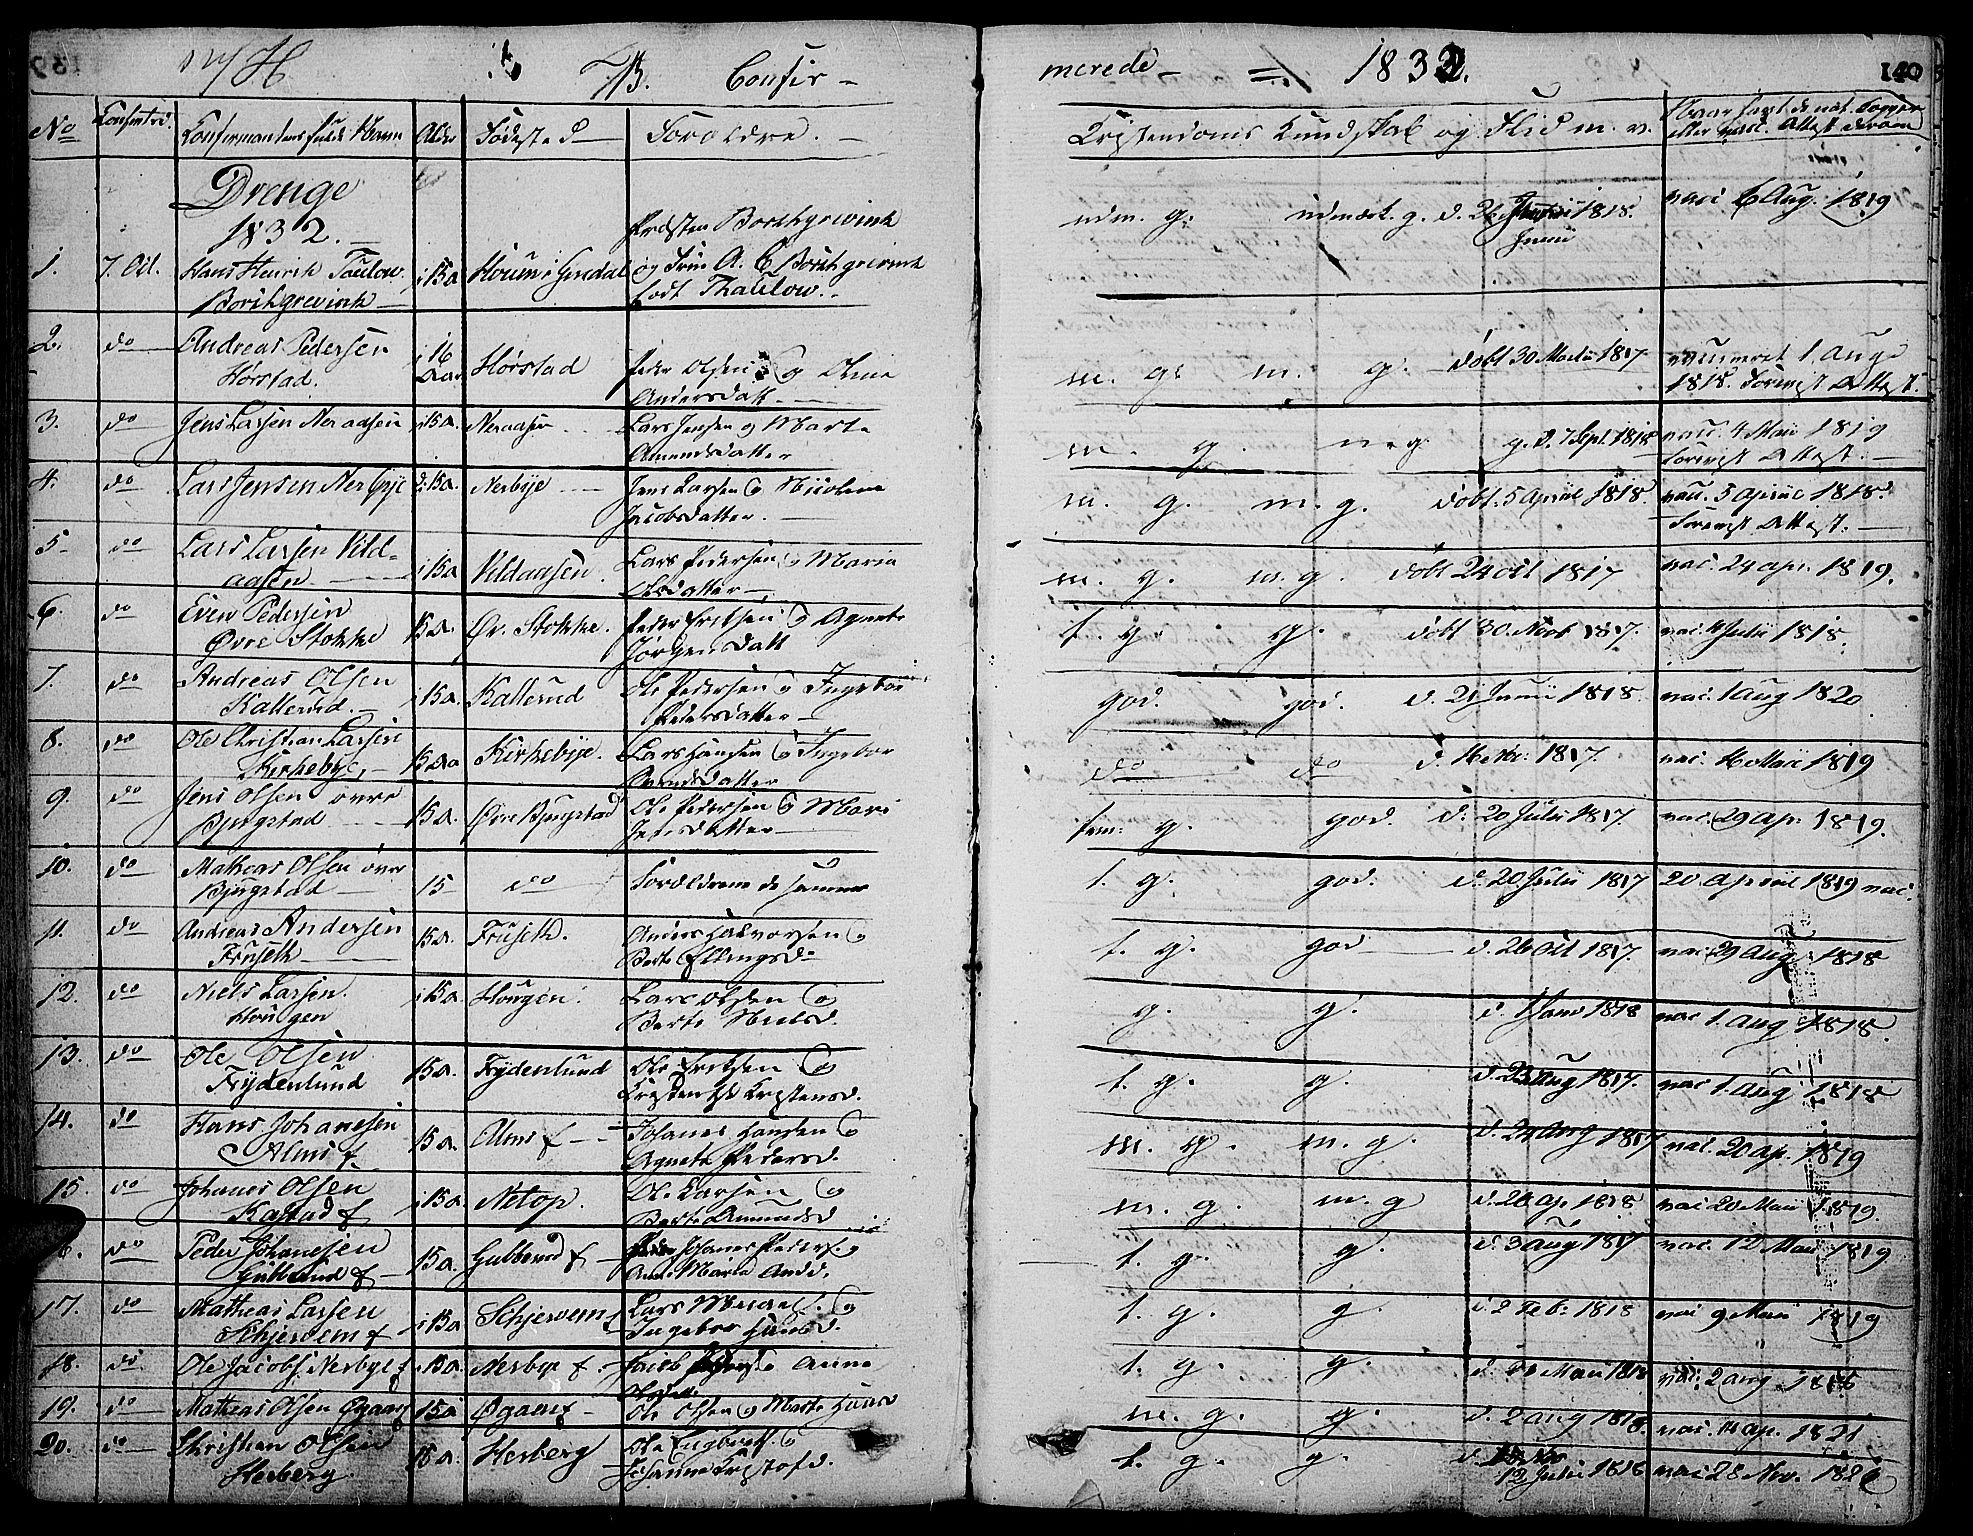 SAH, Vardal prestekontor, H/Ha/Hab/L0004: Klokkerbok nr. 4, 1831-1853, s. 140